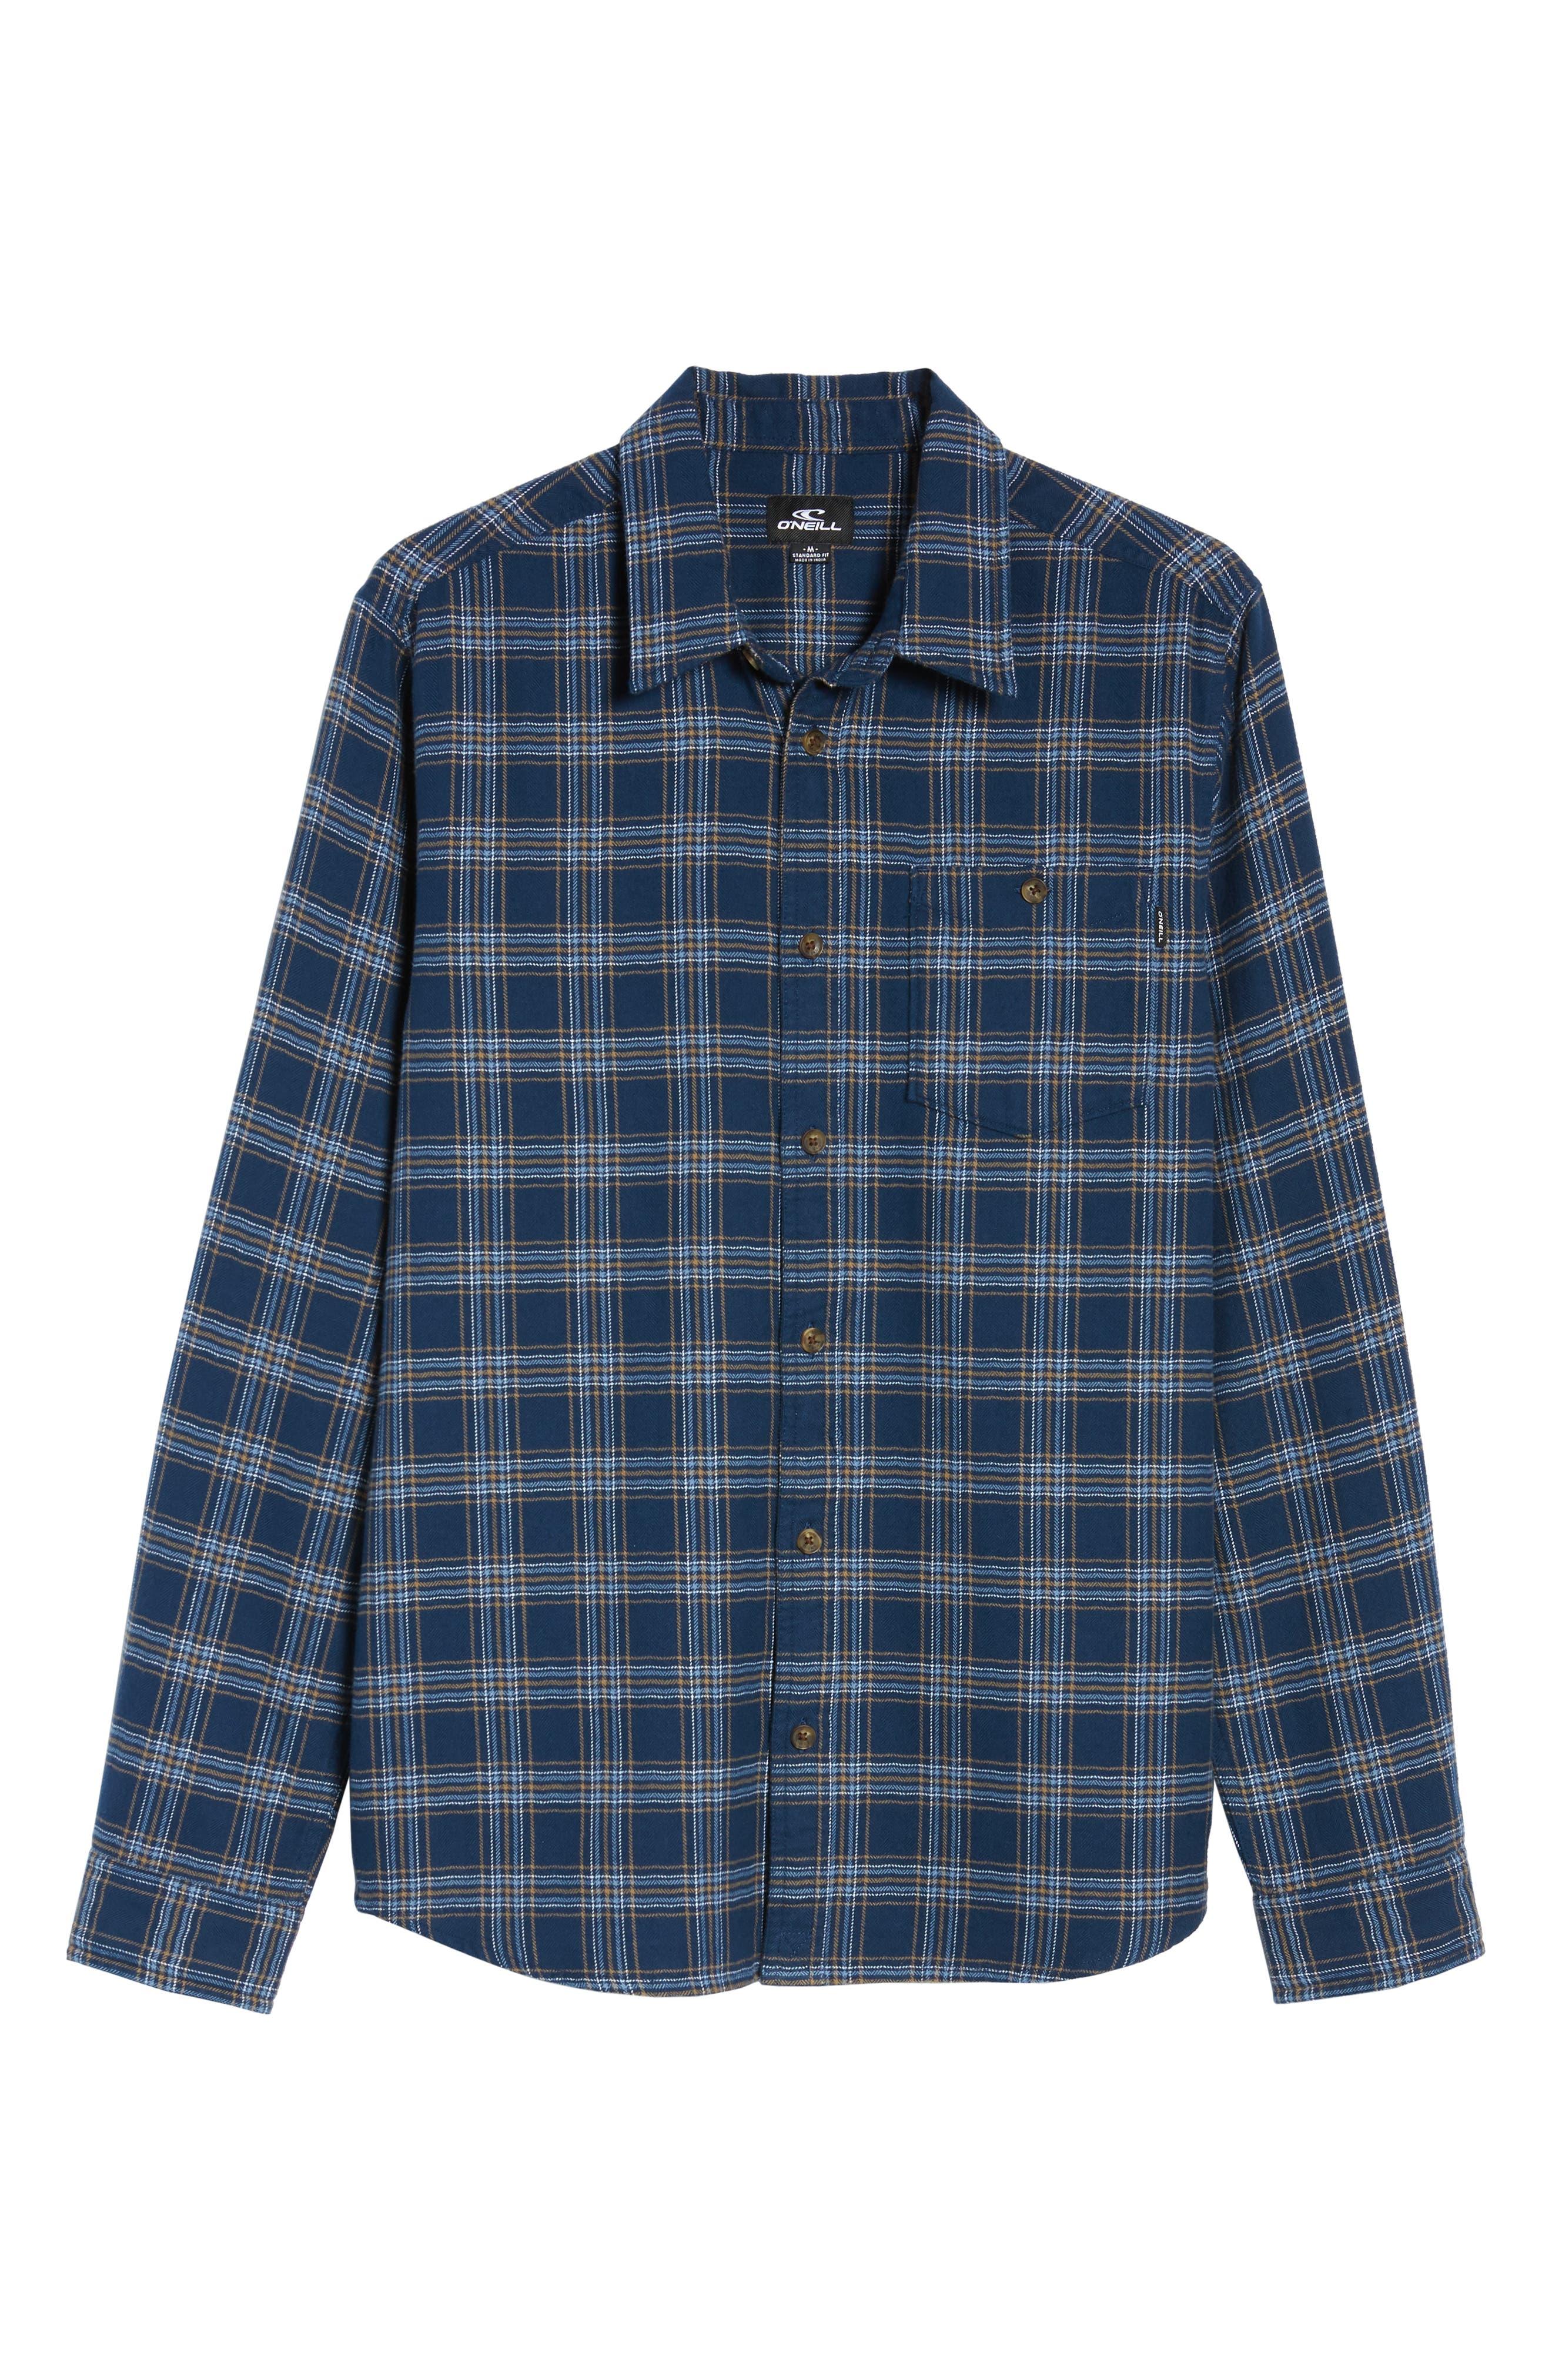 Redmond Flannel Shirt,                             Alternate thumbnail 6, color,                             NAVY